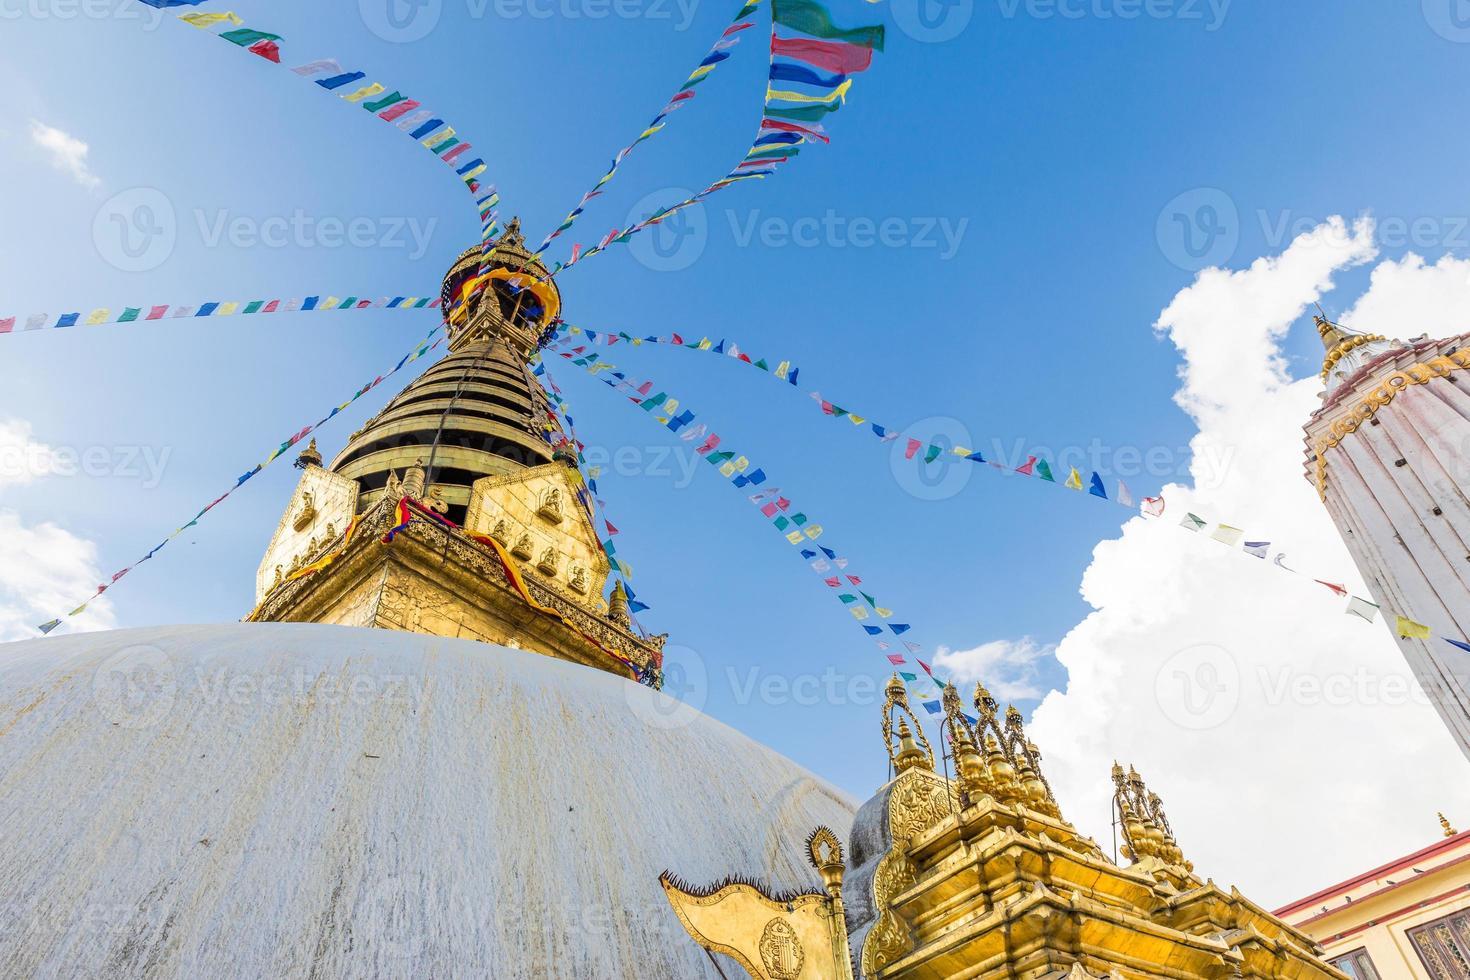 tempio di swayambhunath, tempio delle scimmie Kathmandu, Nepal. foto